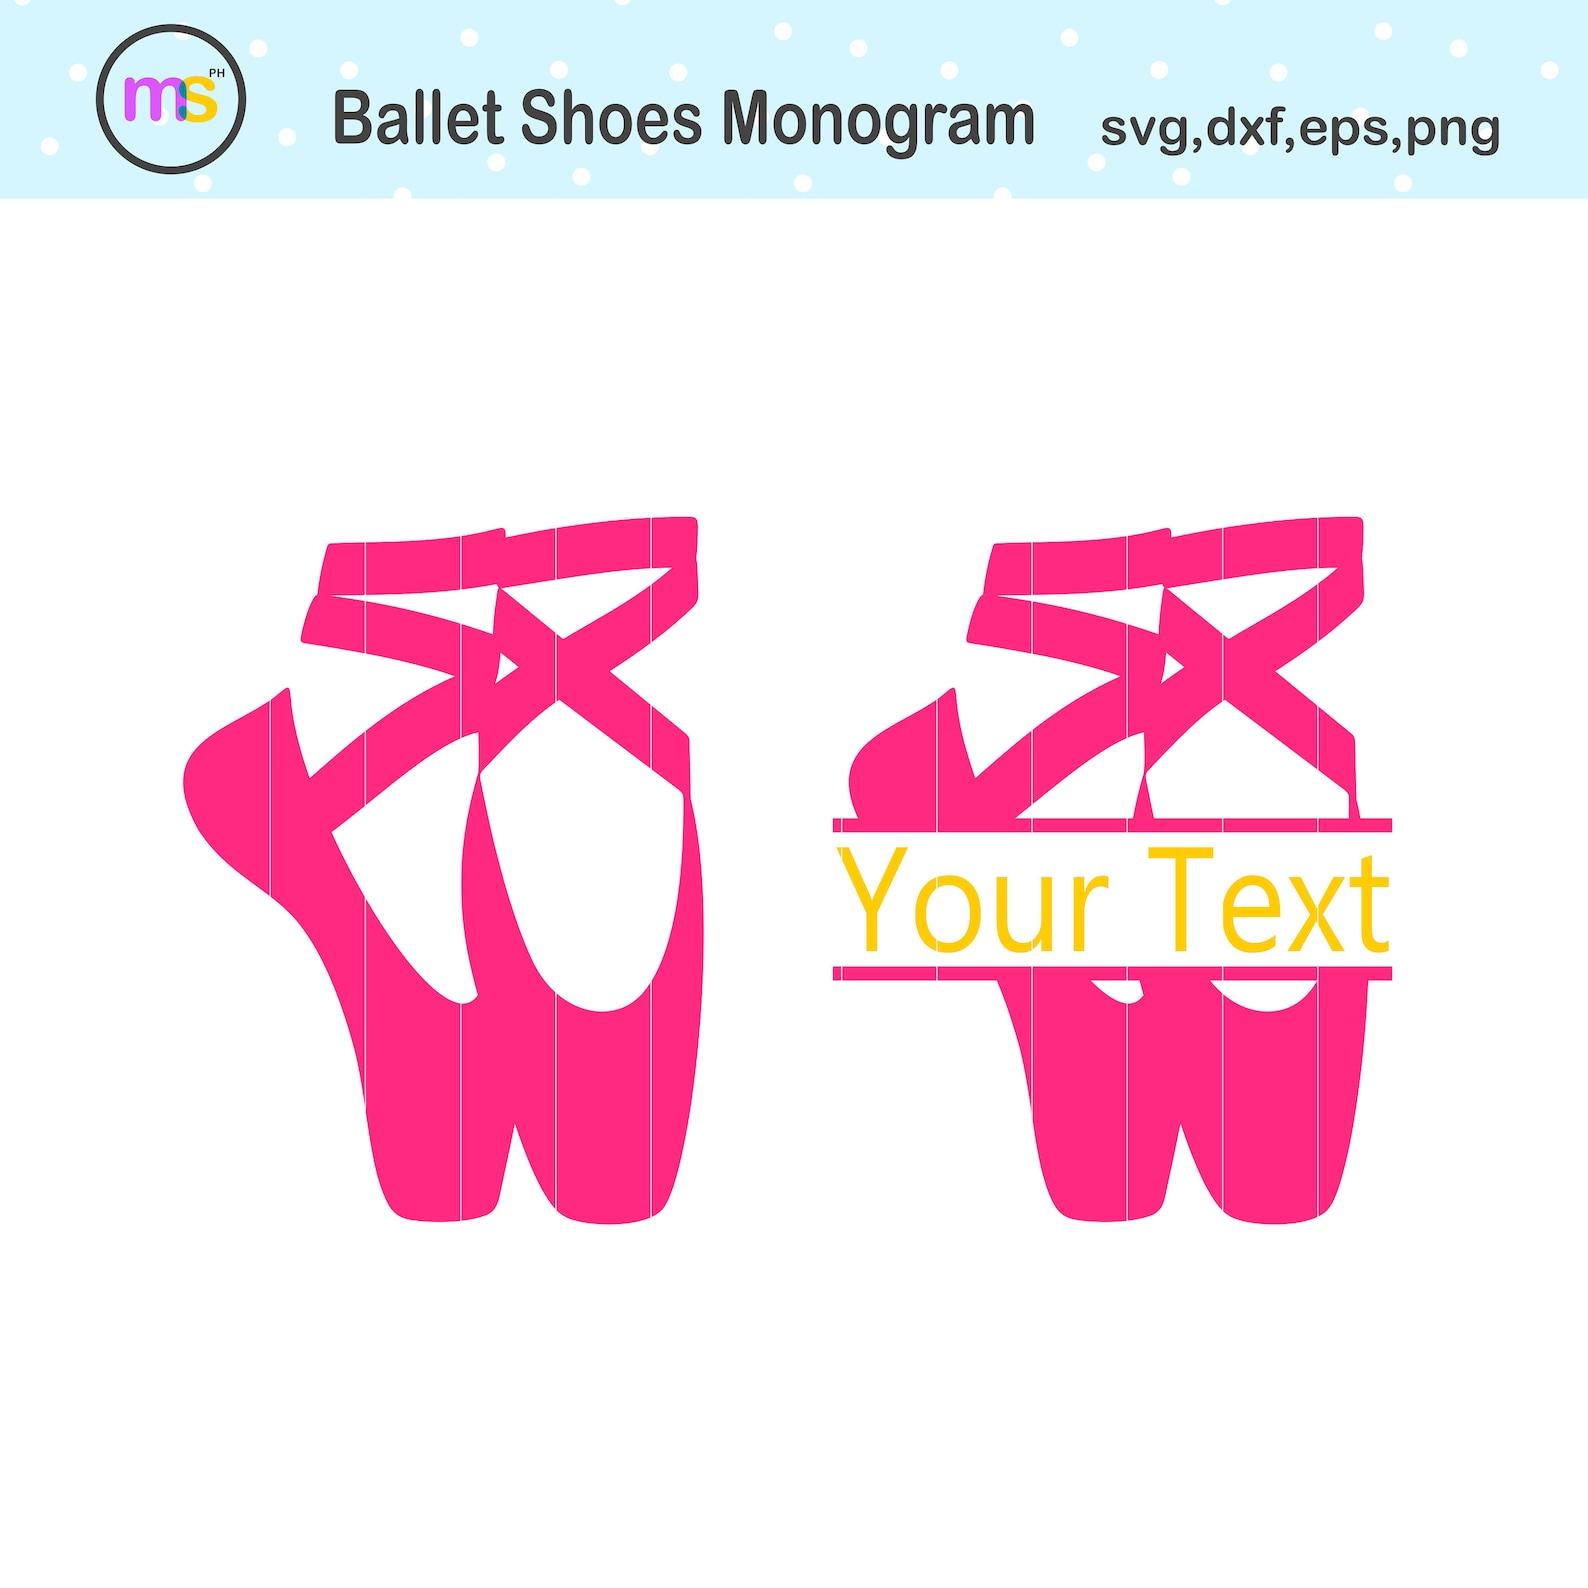 ballet monogram svg, ballerina shoes svg, ballet shoes monogram svg, ballet svg, ballerina svg, ballet shoes clip art, ballerina